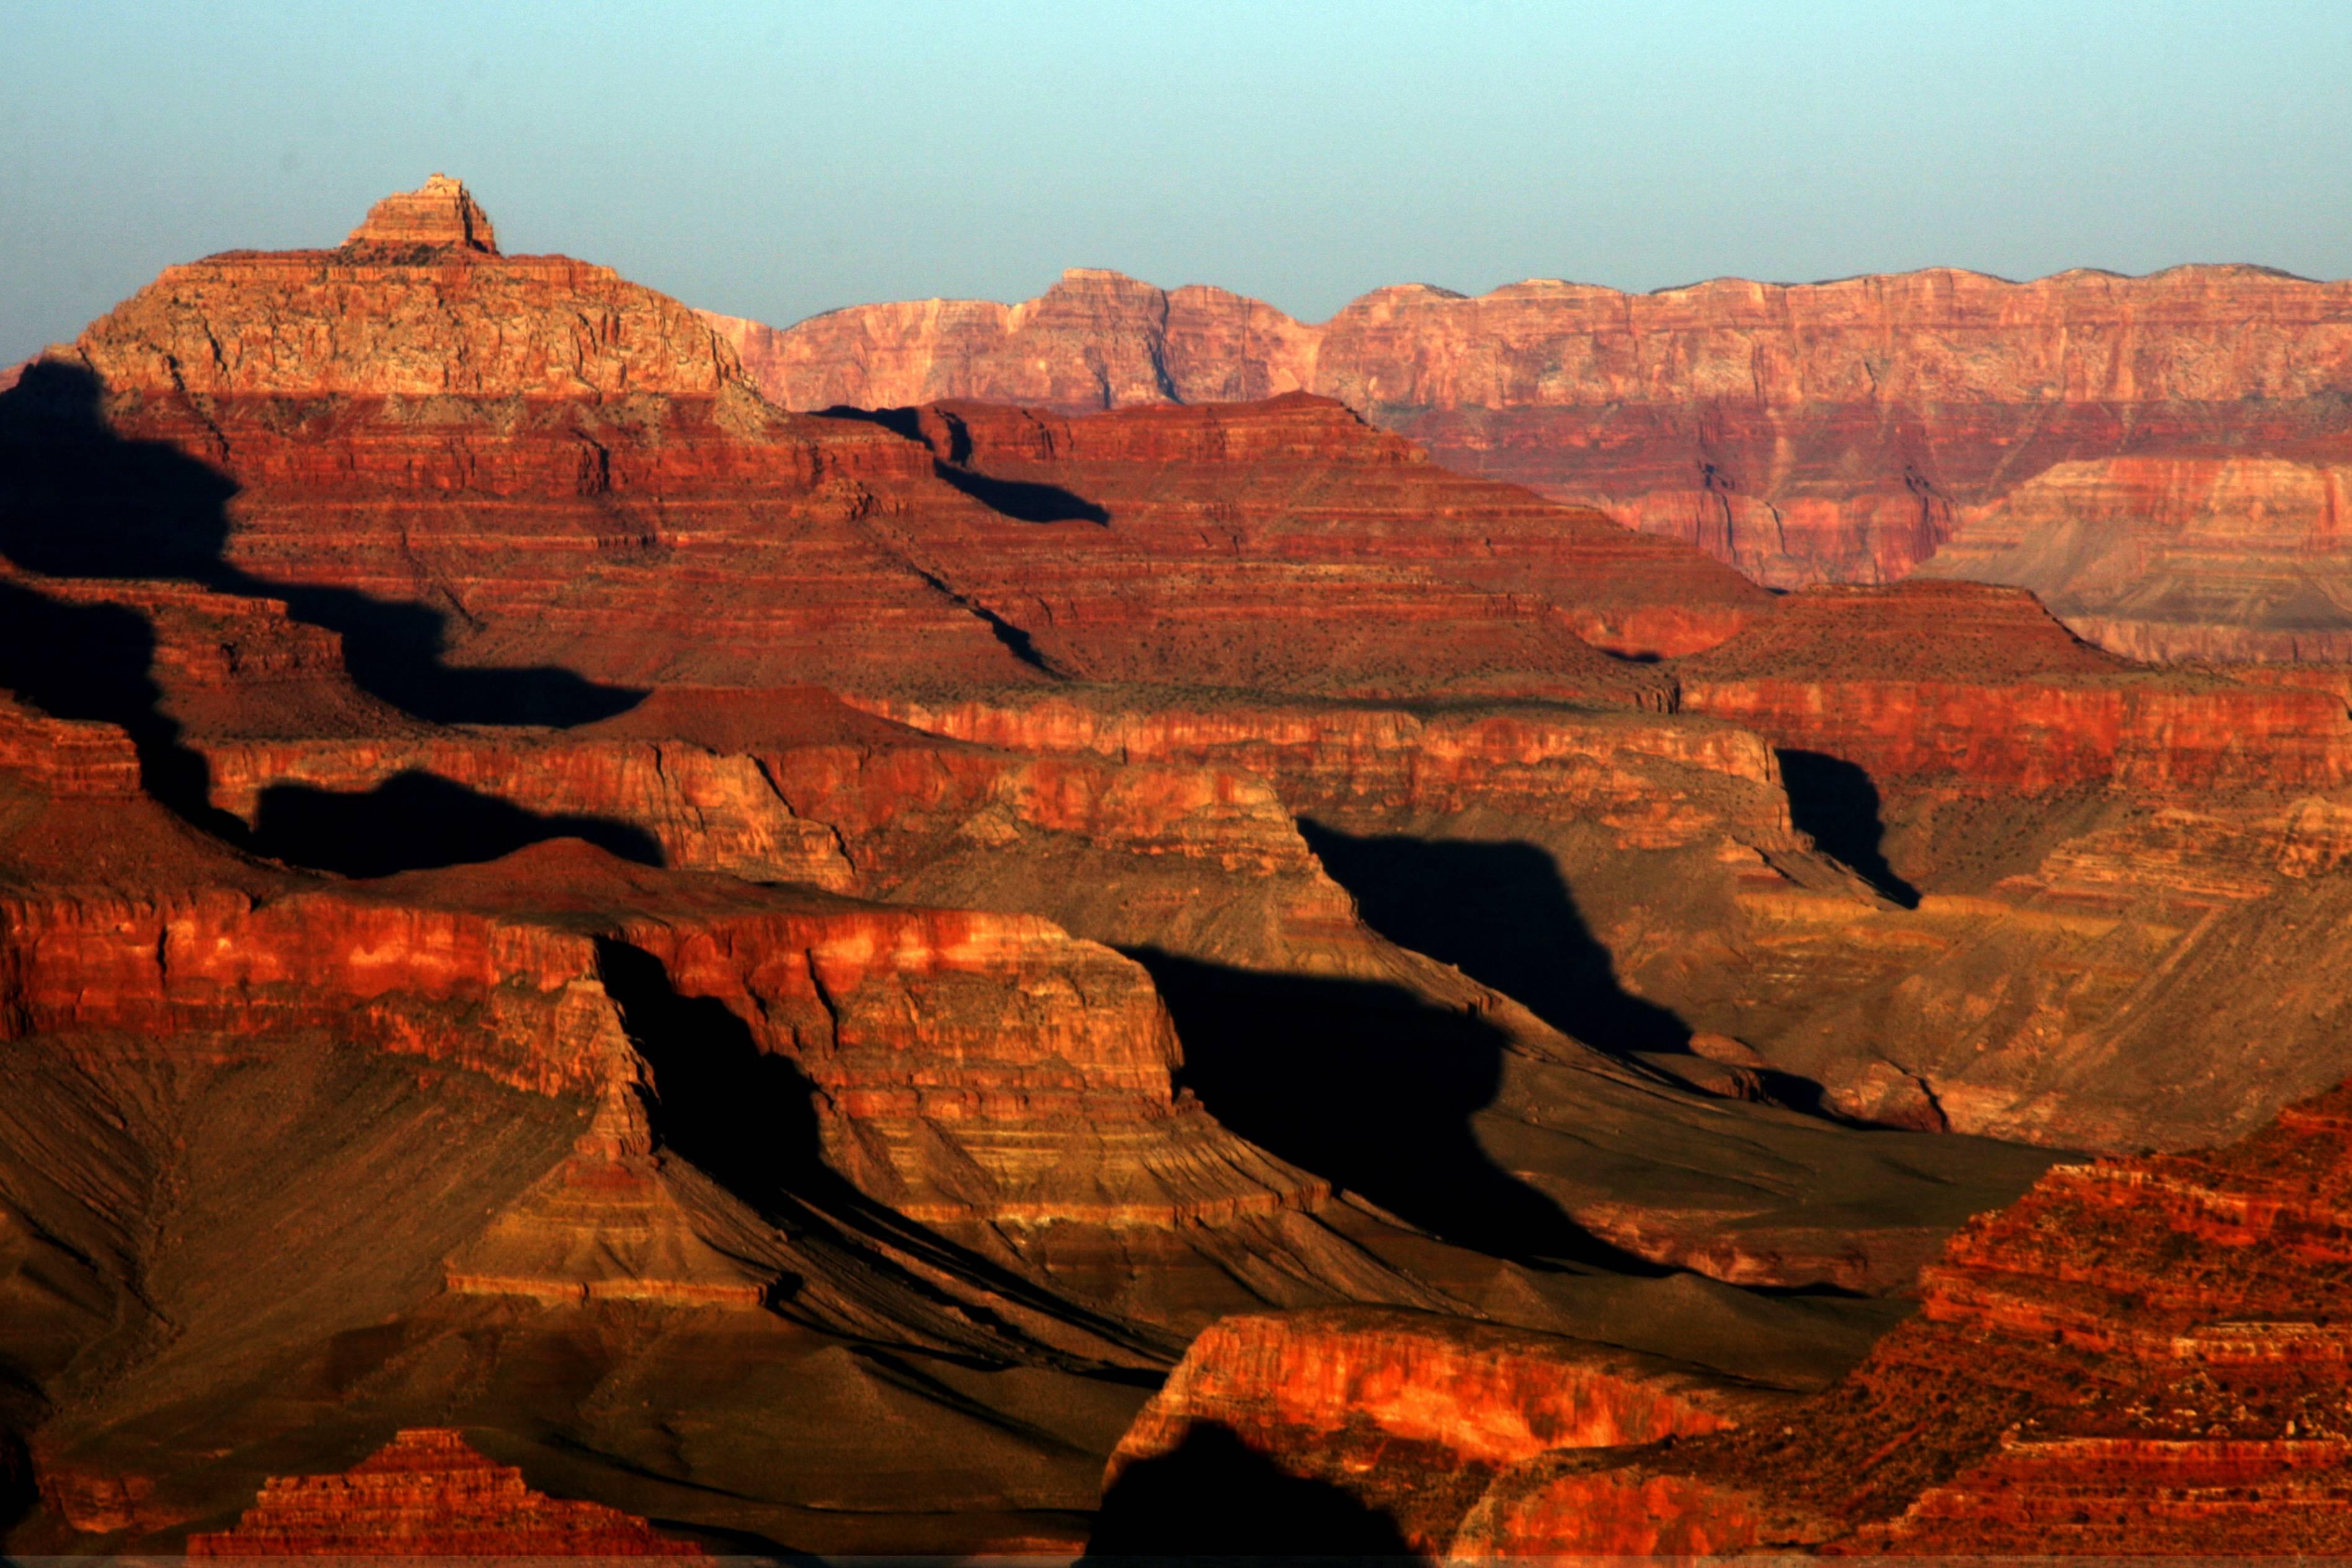 Grand Canyon clipart hd wallpaper Wallfoy Wallpaper Cave Canyon Images